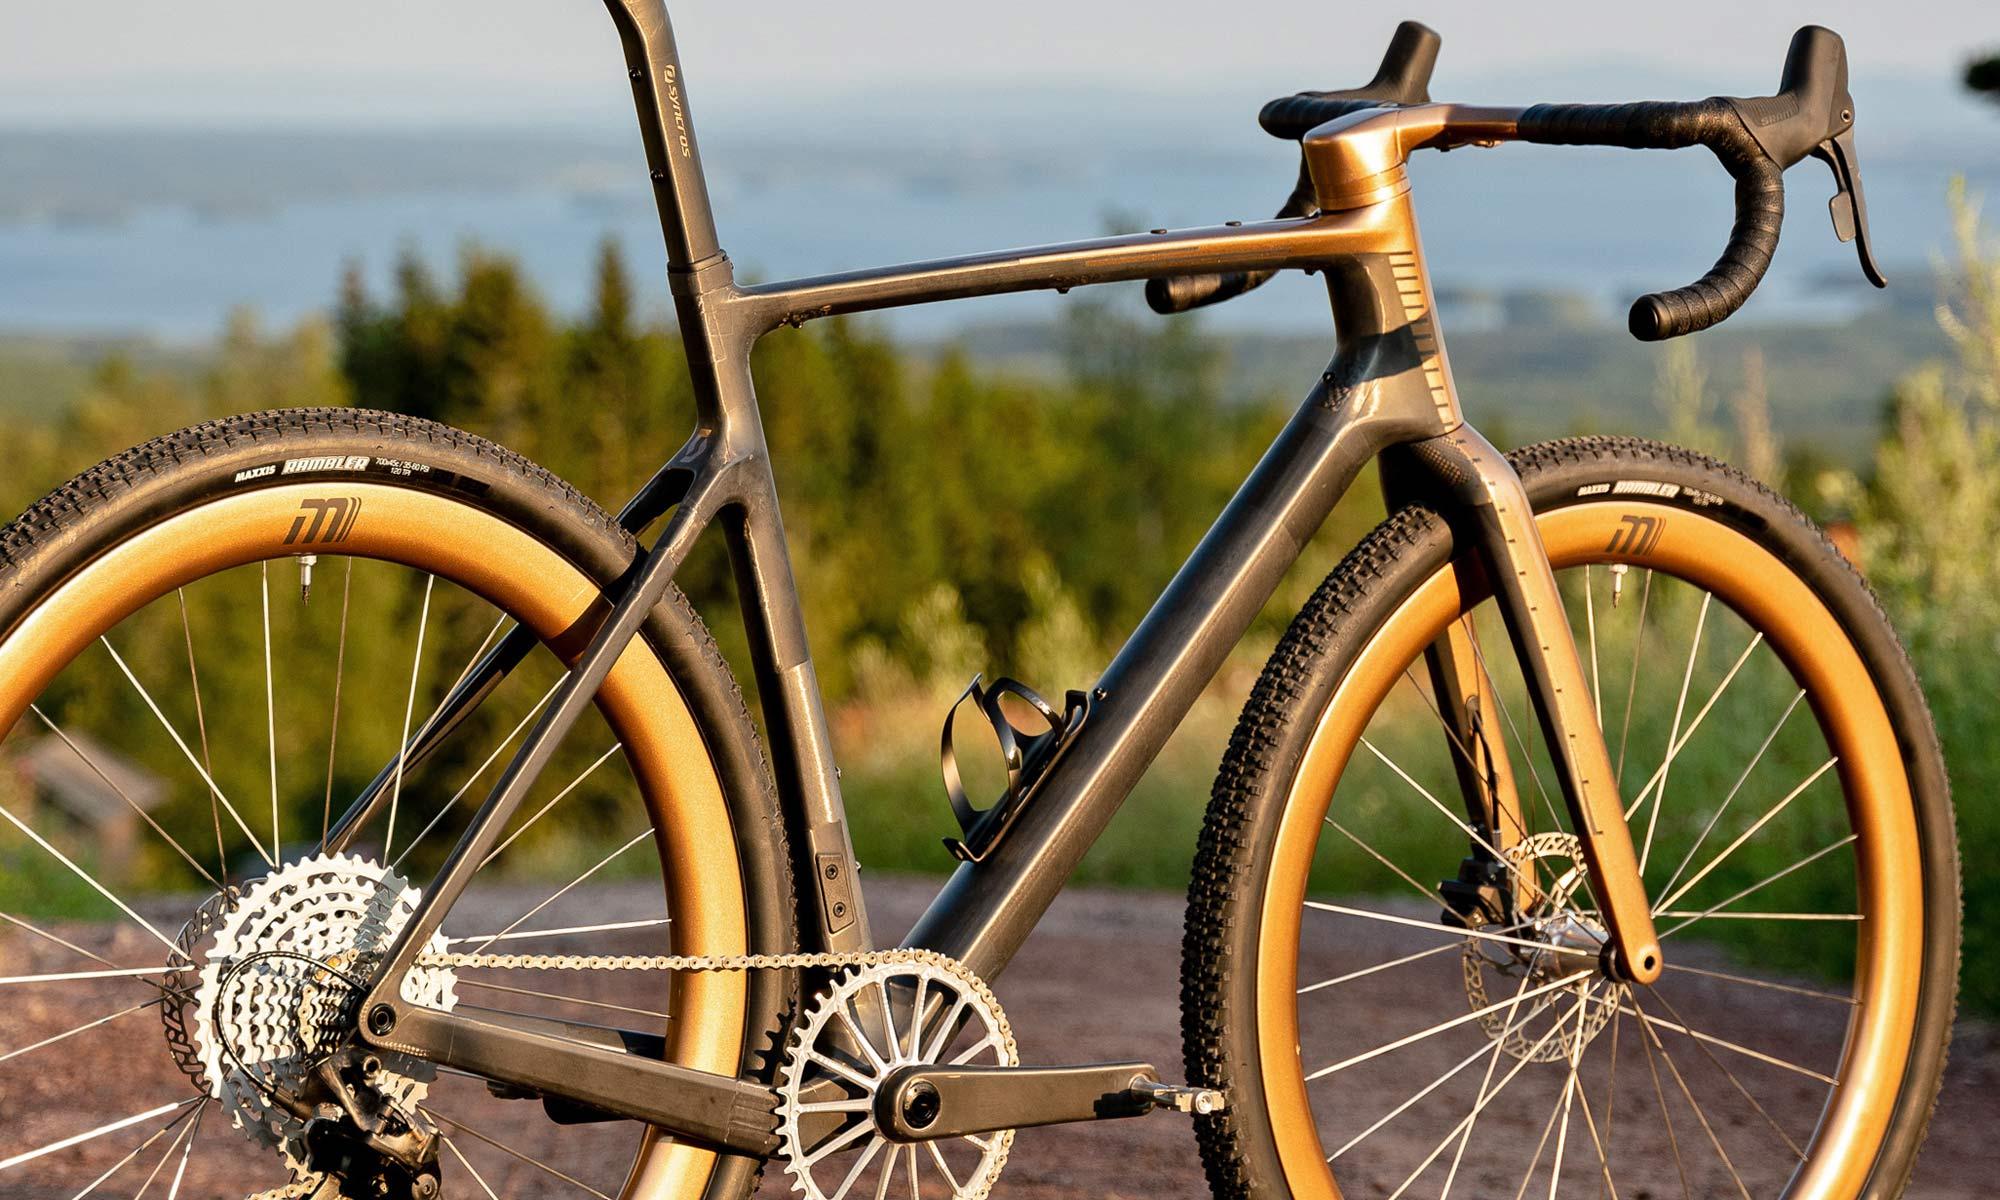 custom Scott Addict Gravel Tuned Dangerholm edition lightweight carbon prototype gravel bike project,angled detail